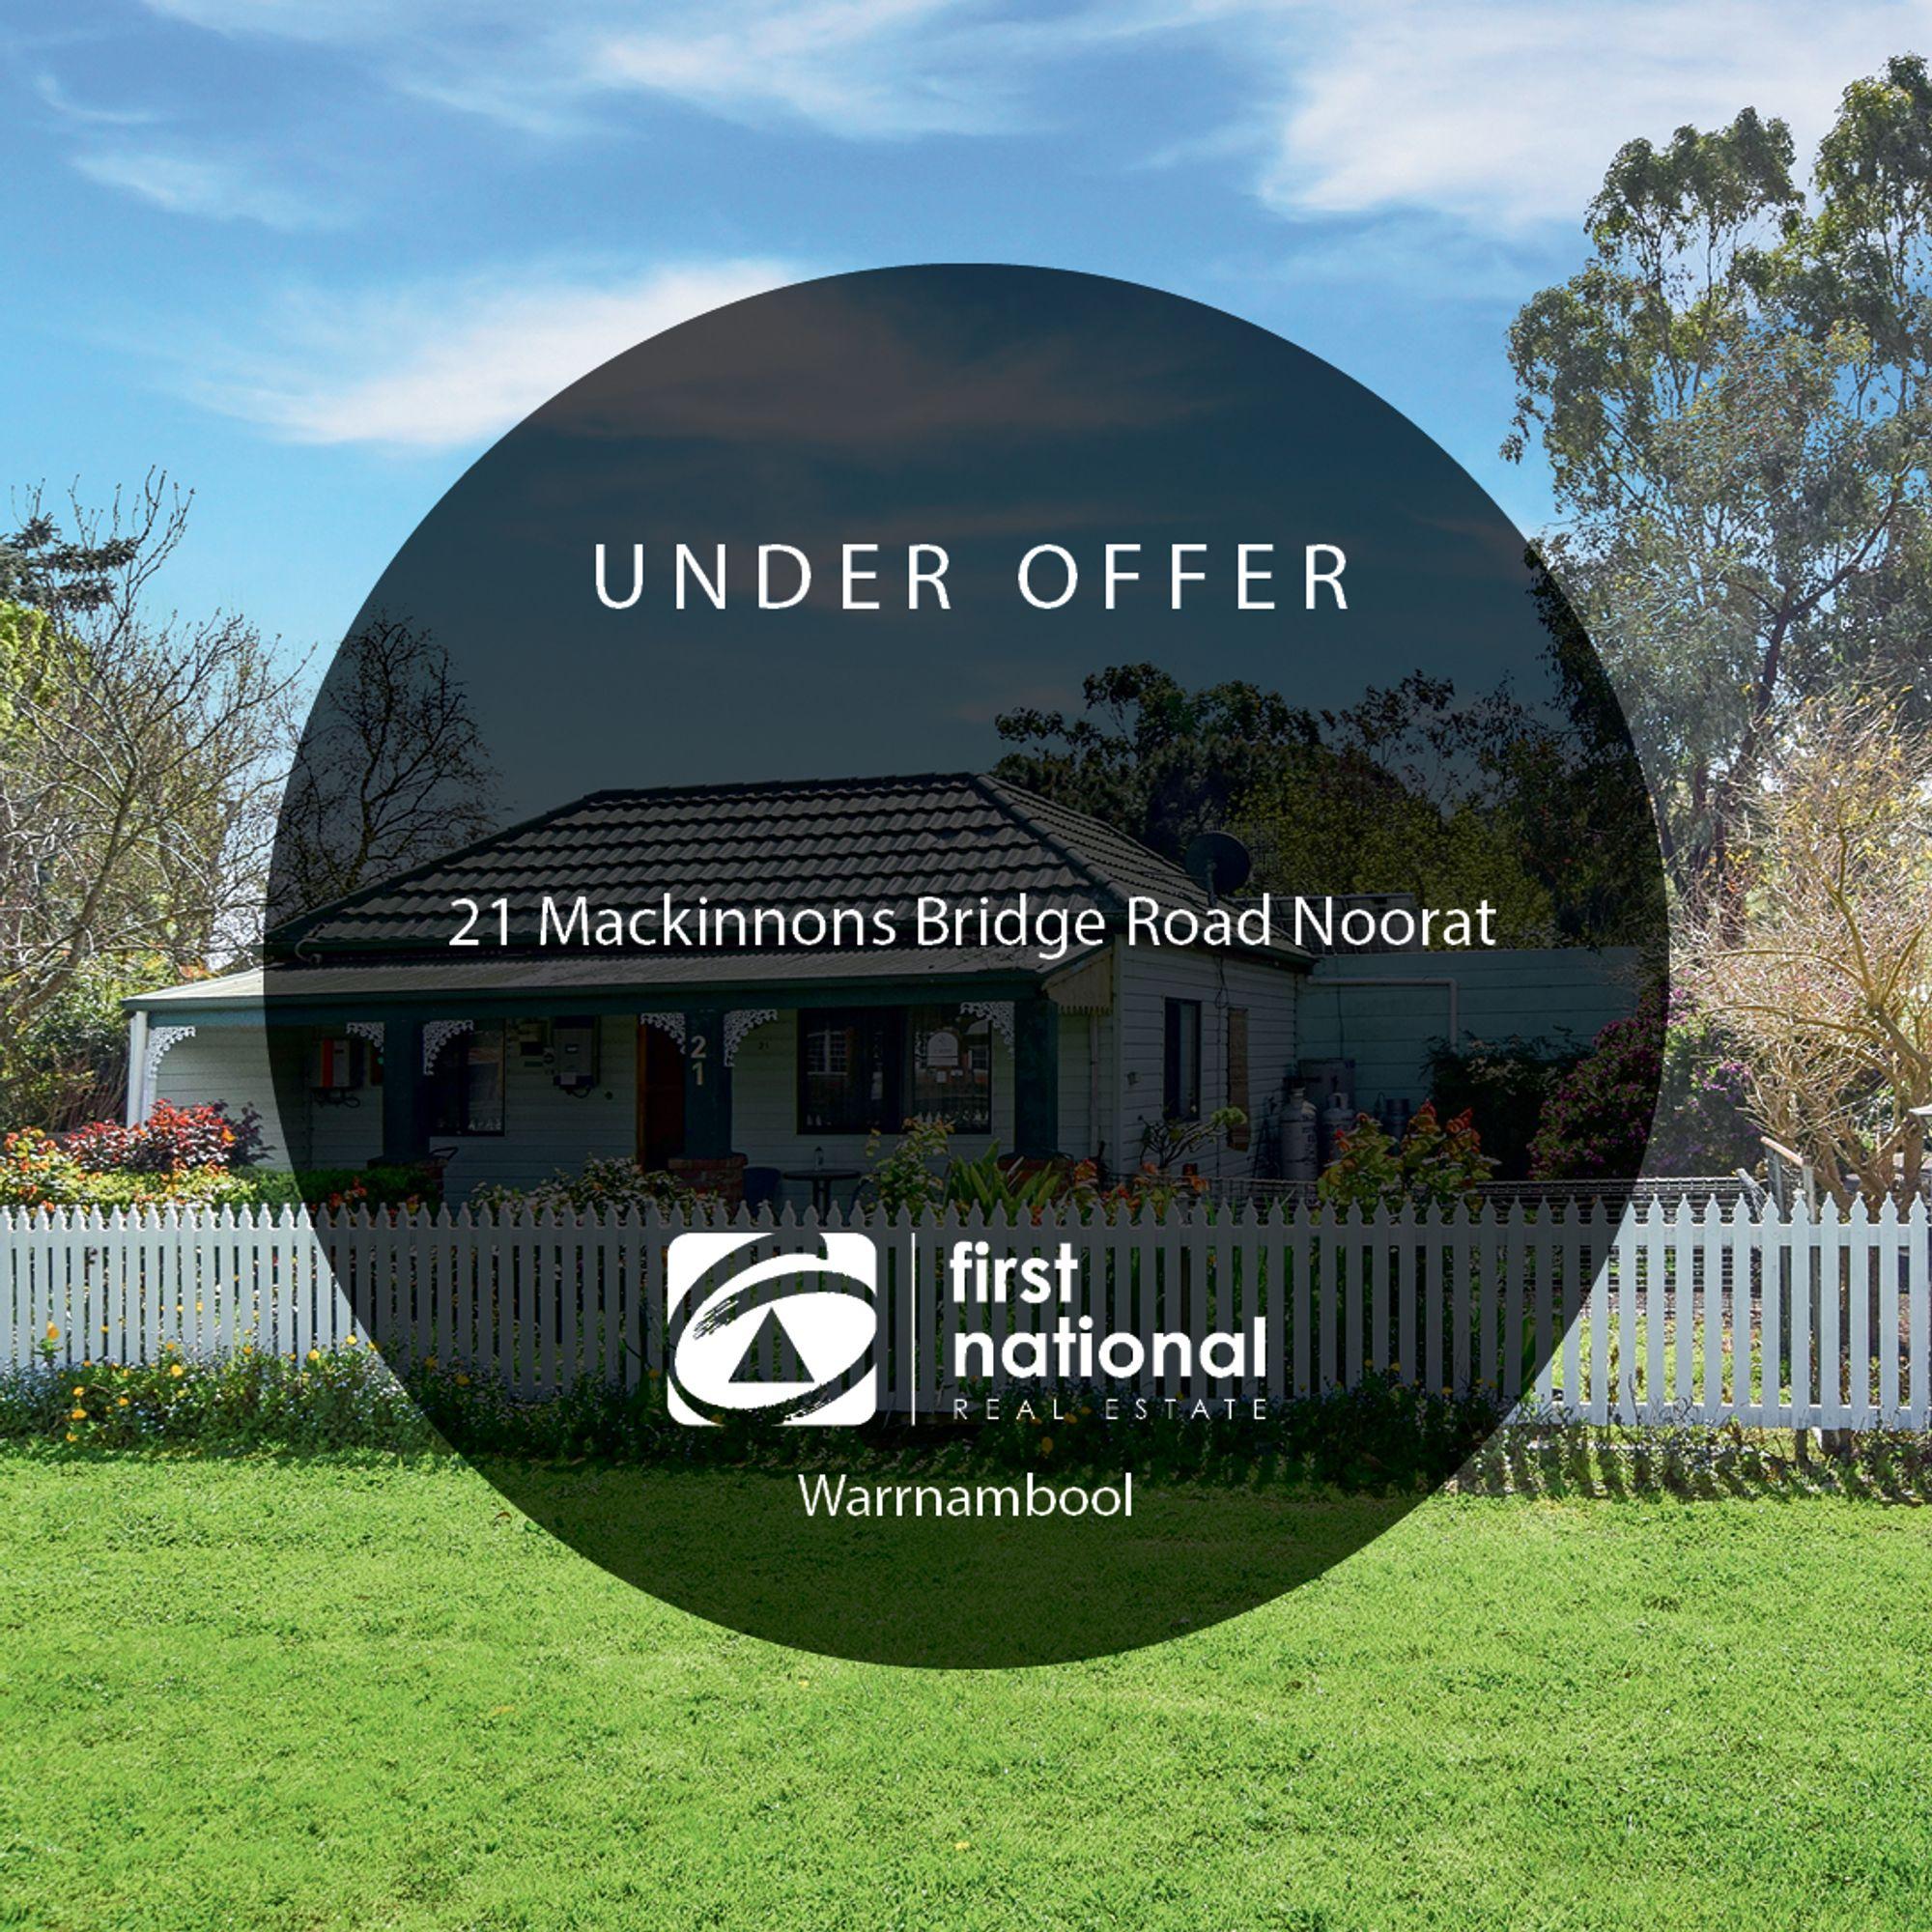 21 Mackinnons Bridge Road, Noorat, VIC 3265